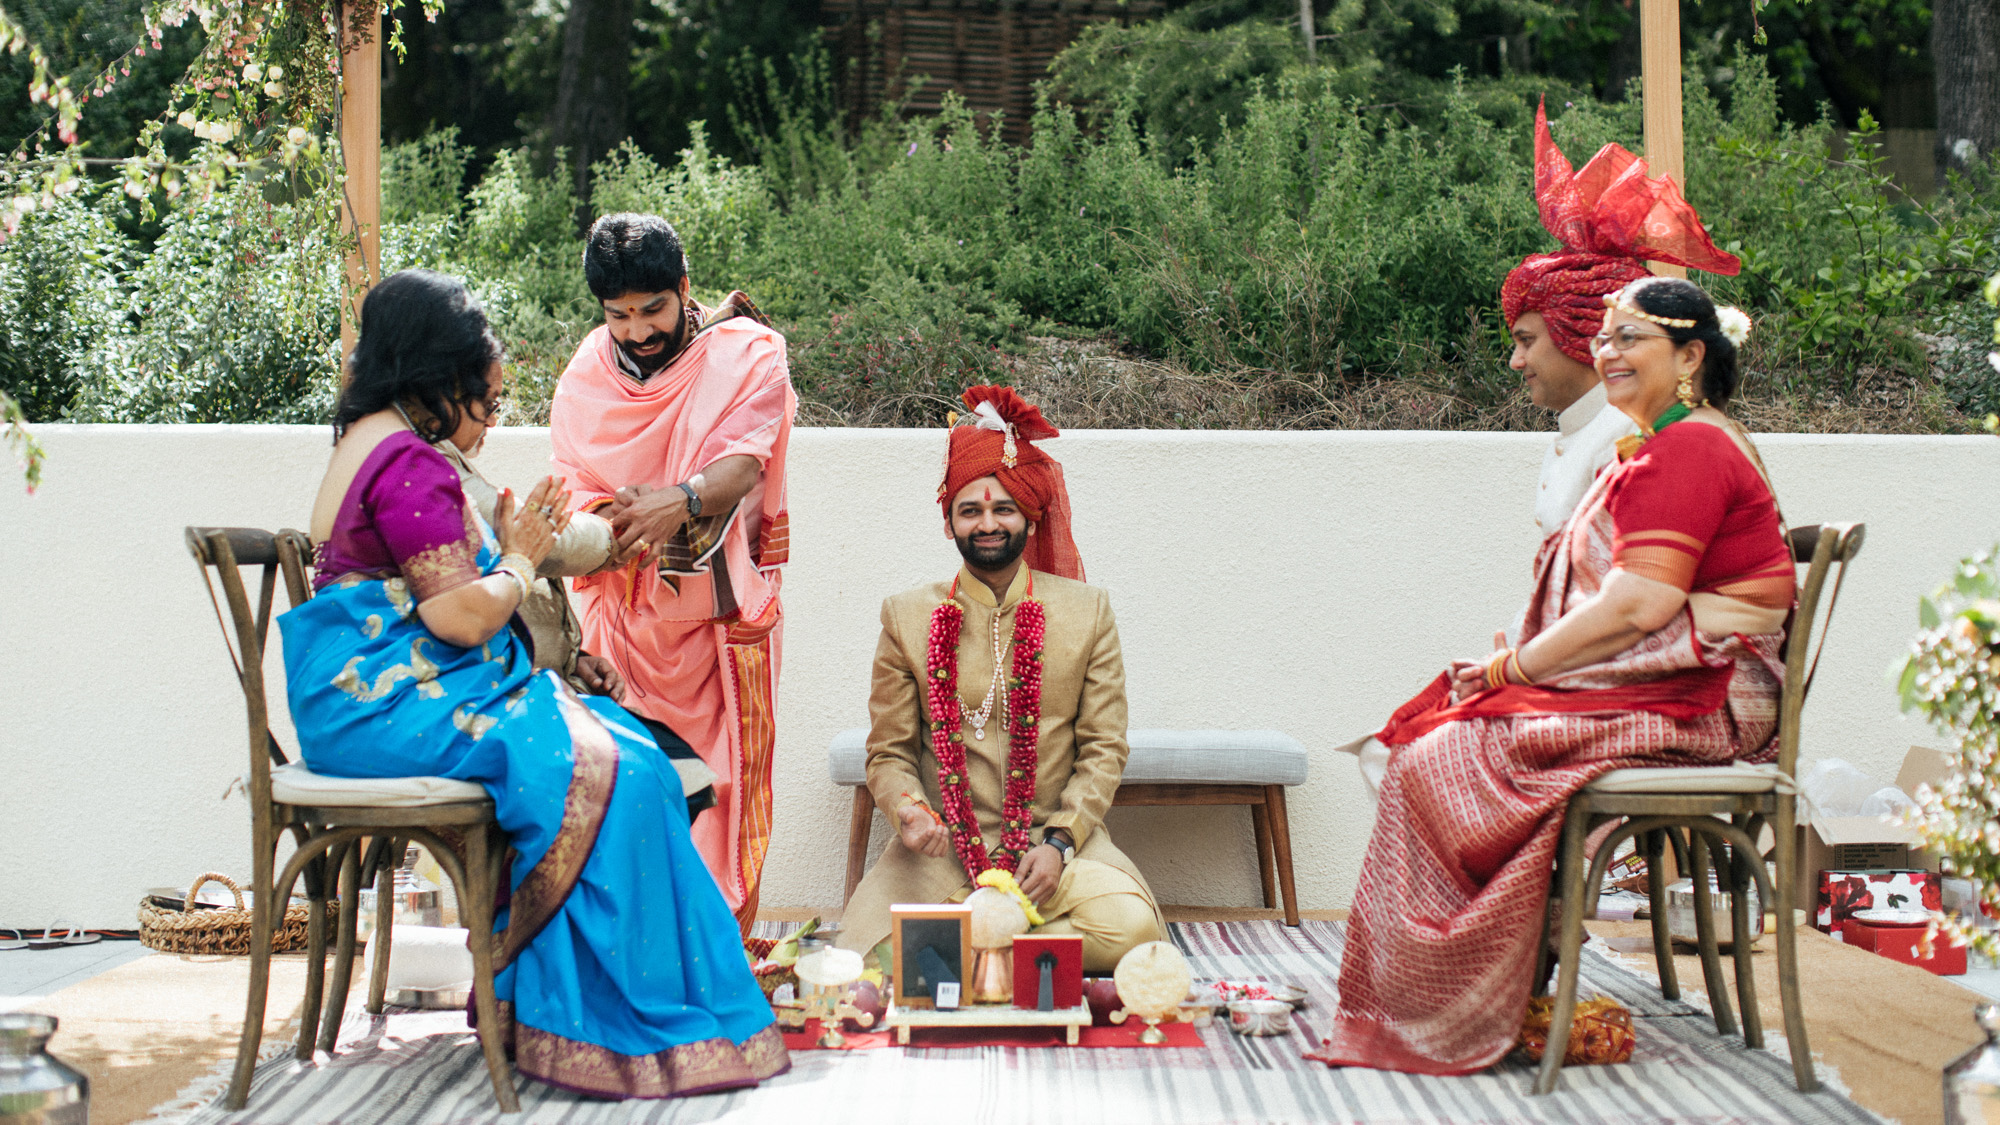 anu_maneesh_alec_vanderboom_Indian_wedding_photography-0093.jpg